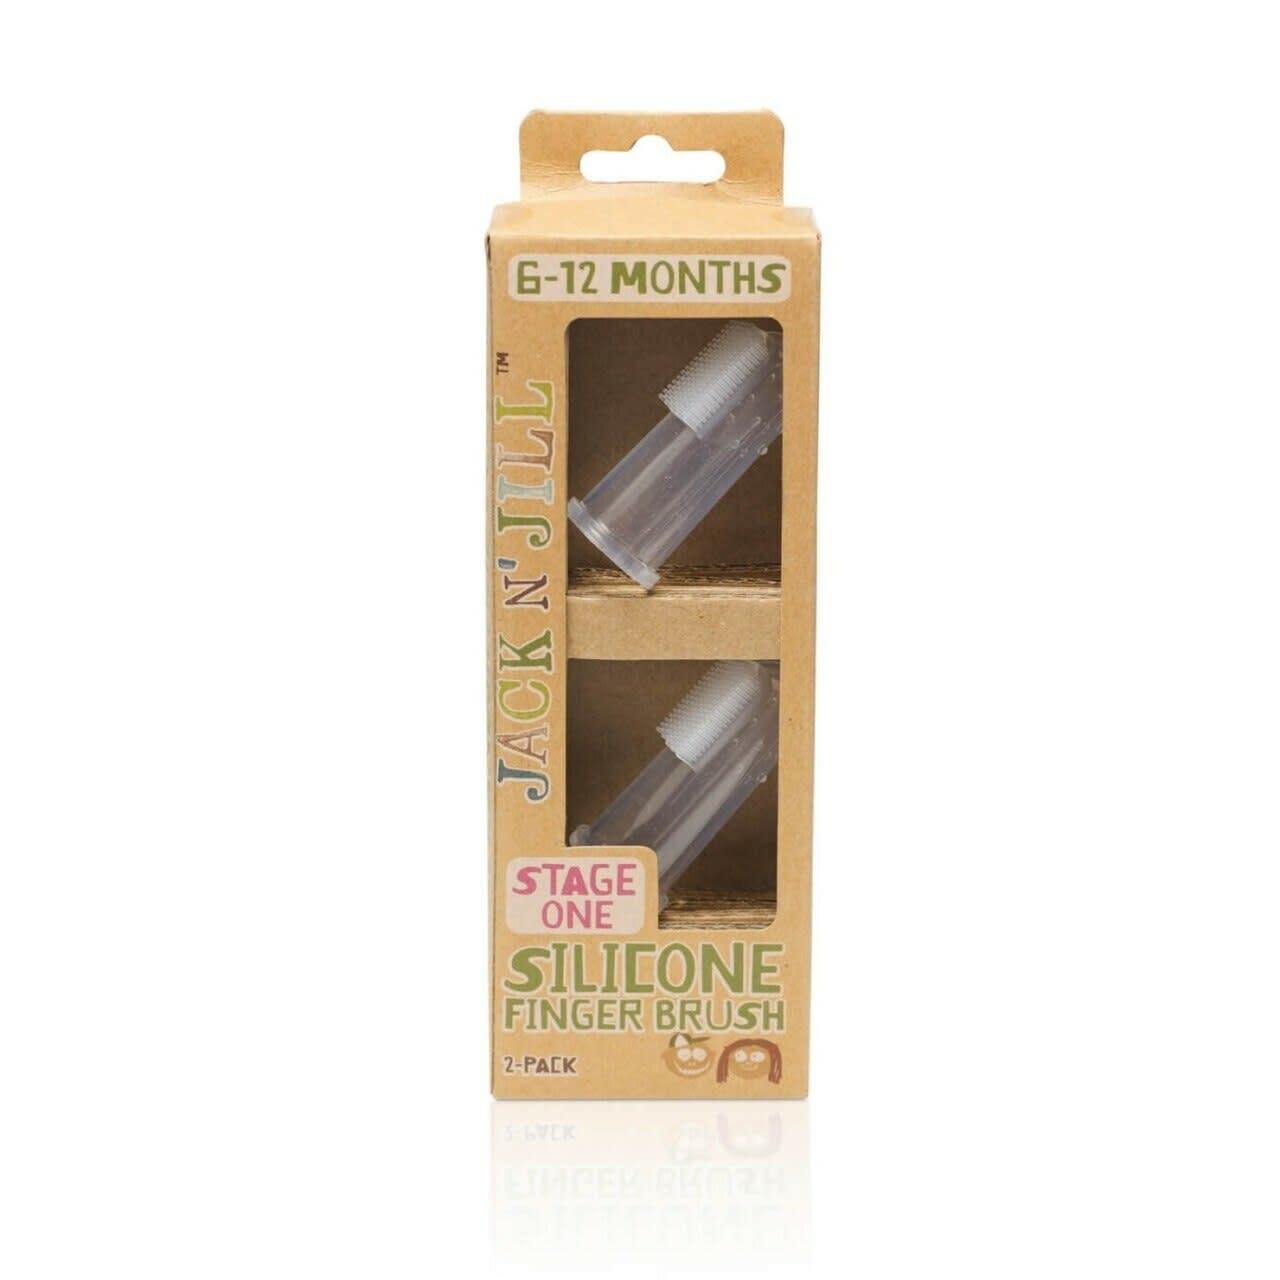 Silicone Finger Brush (2-pack + case)-1